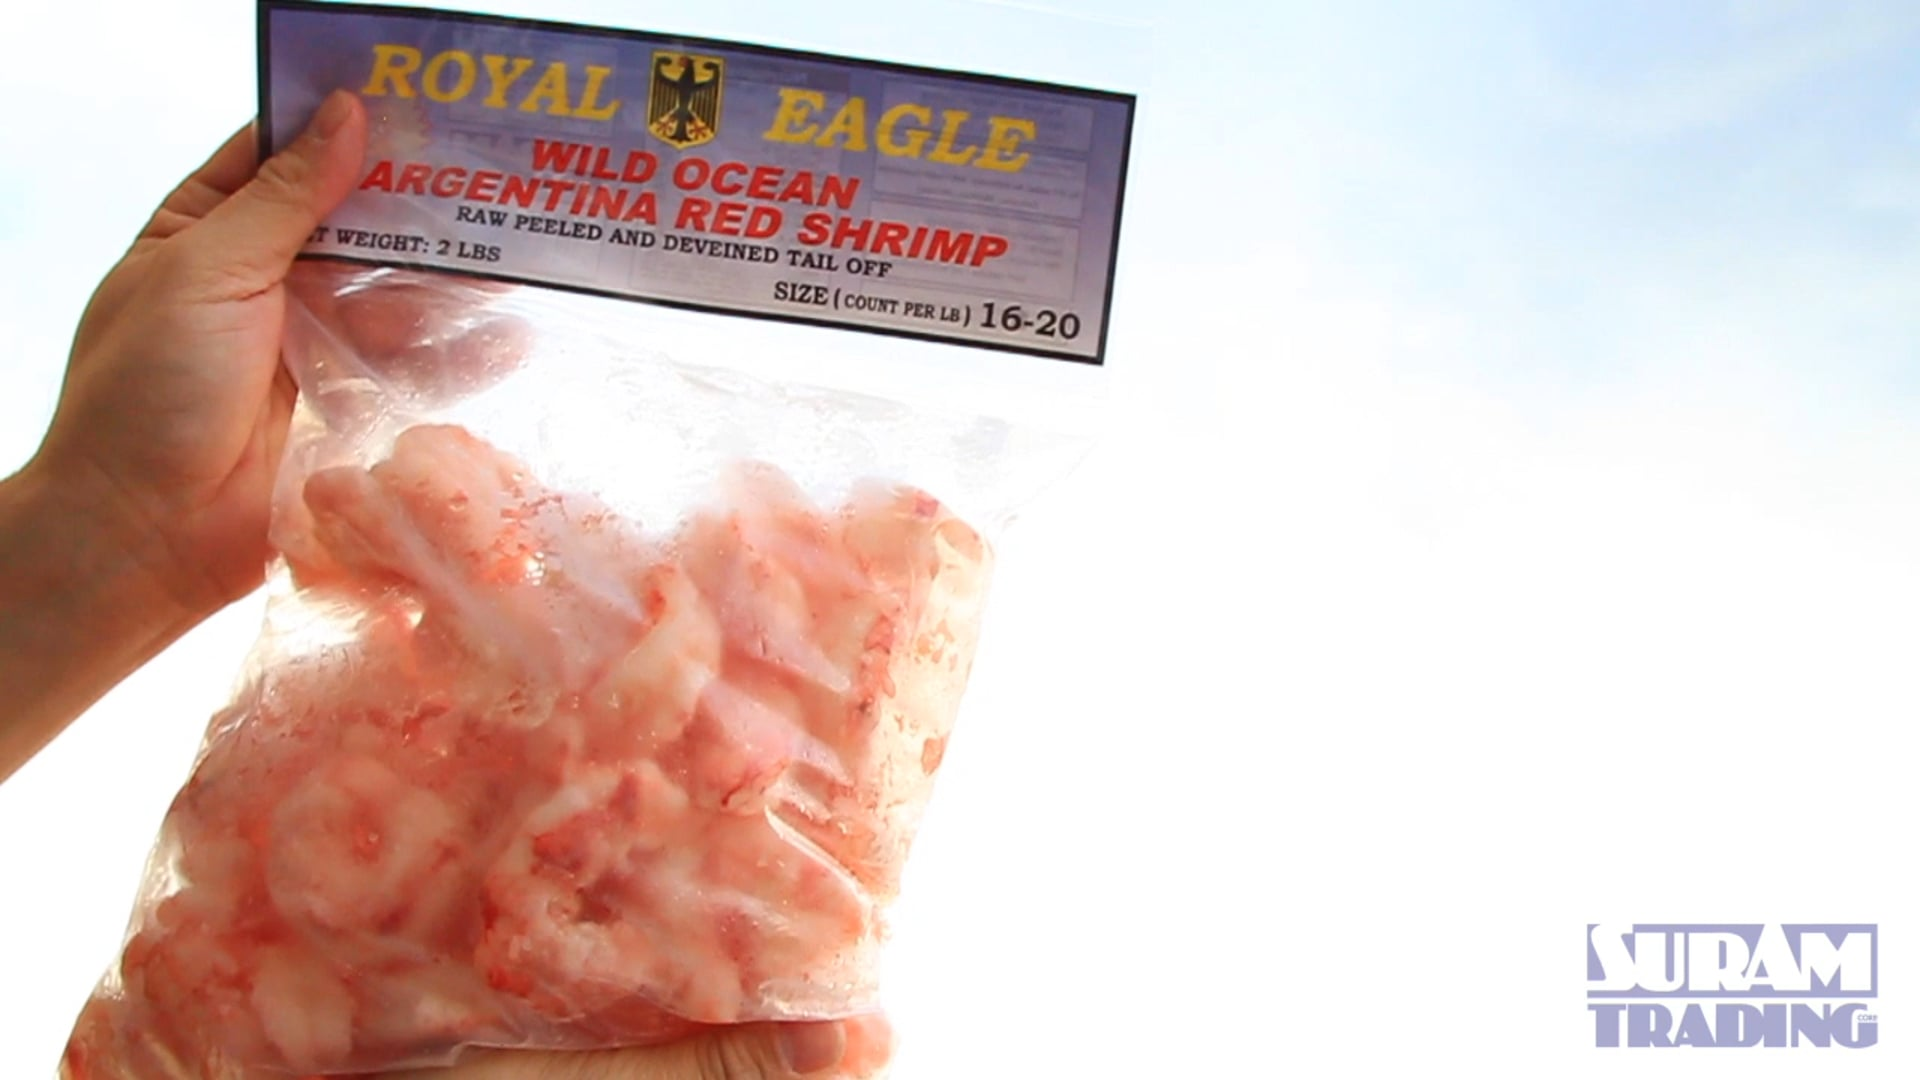 Royal Eagle Shrimp Bag Preview